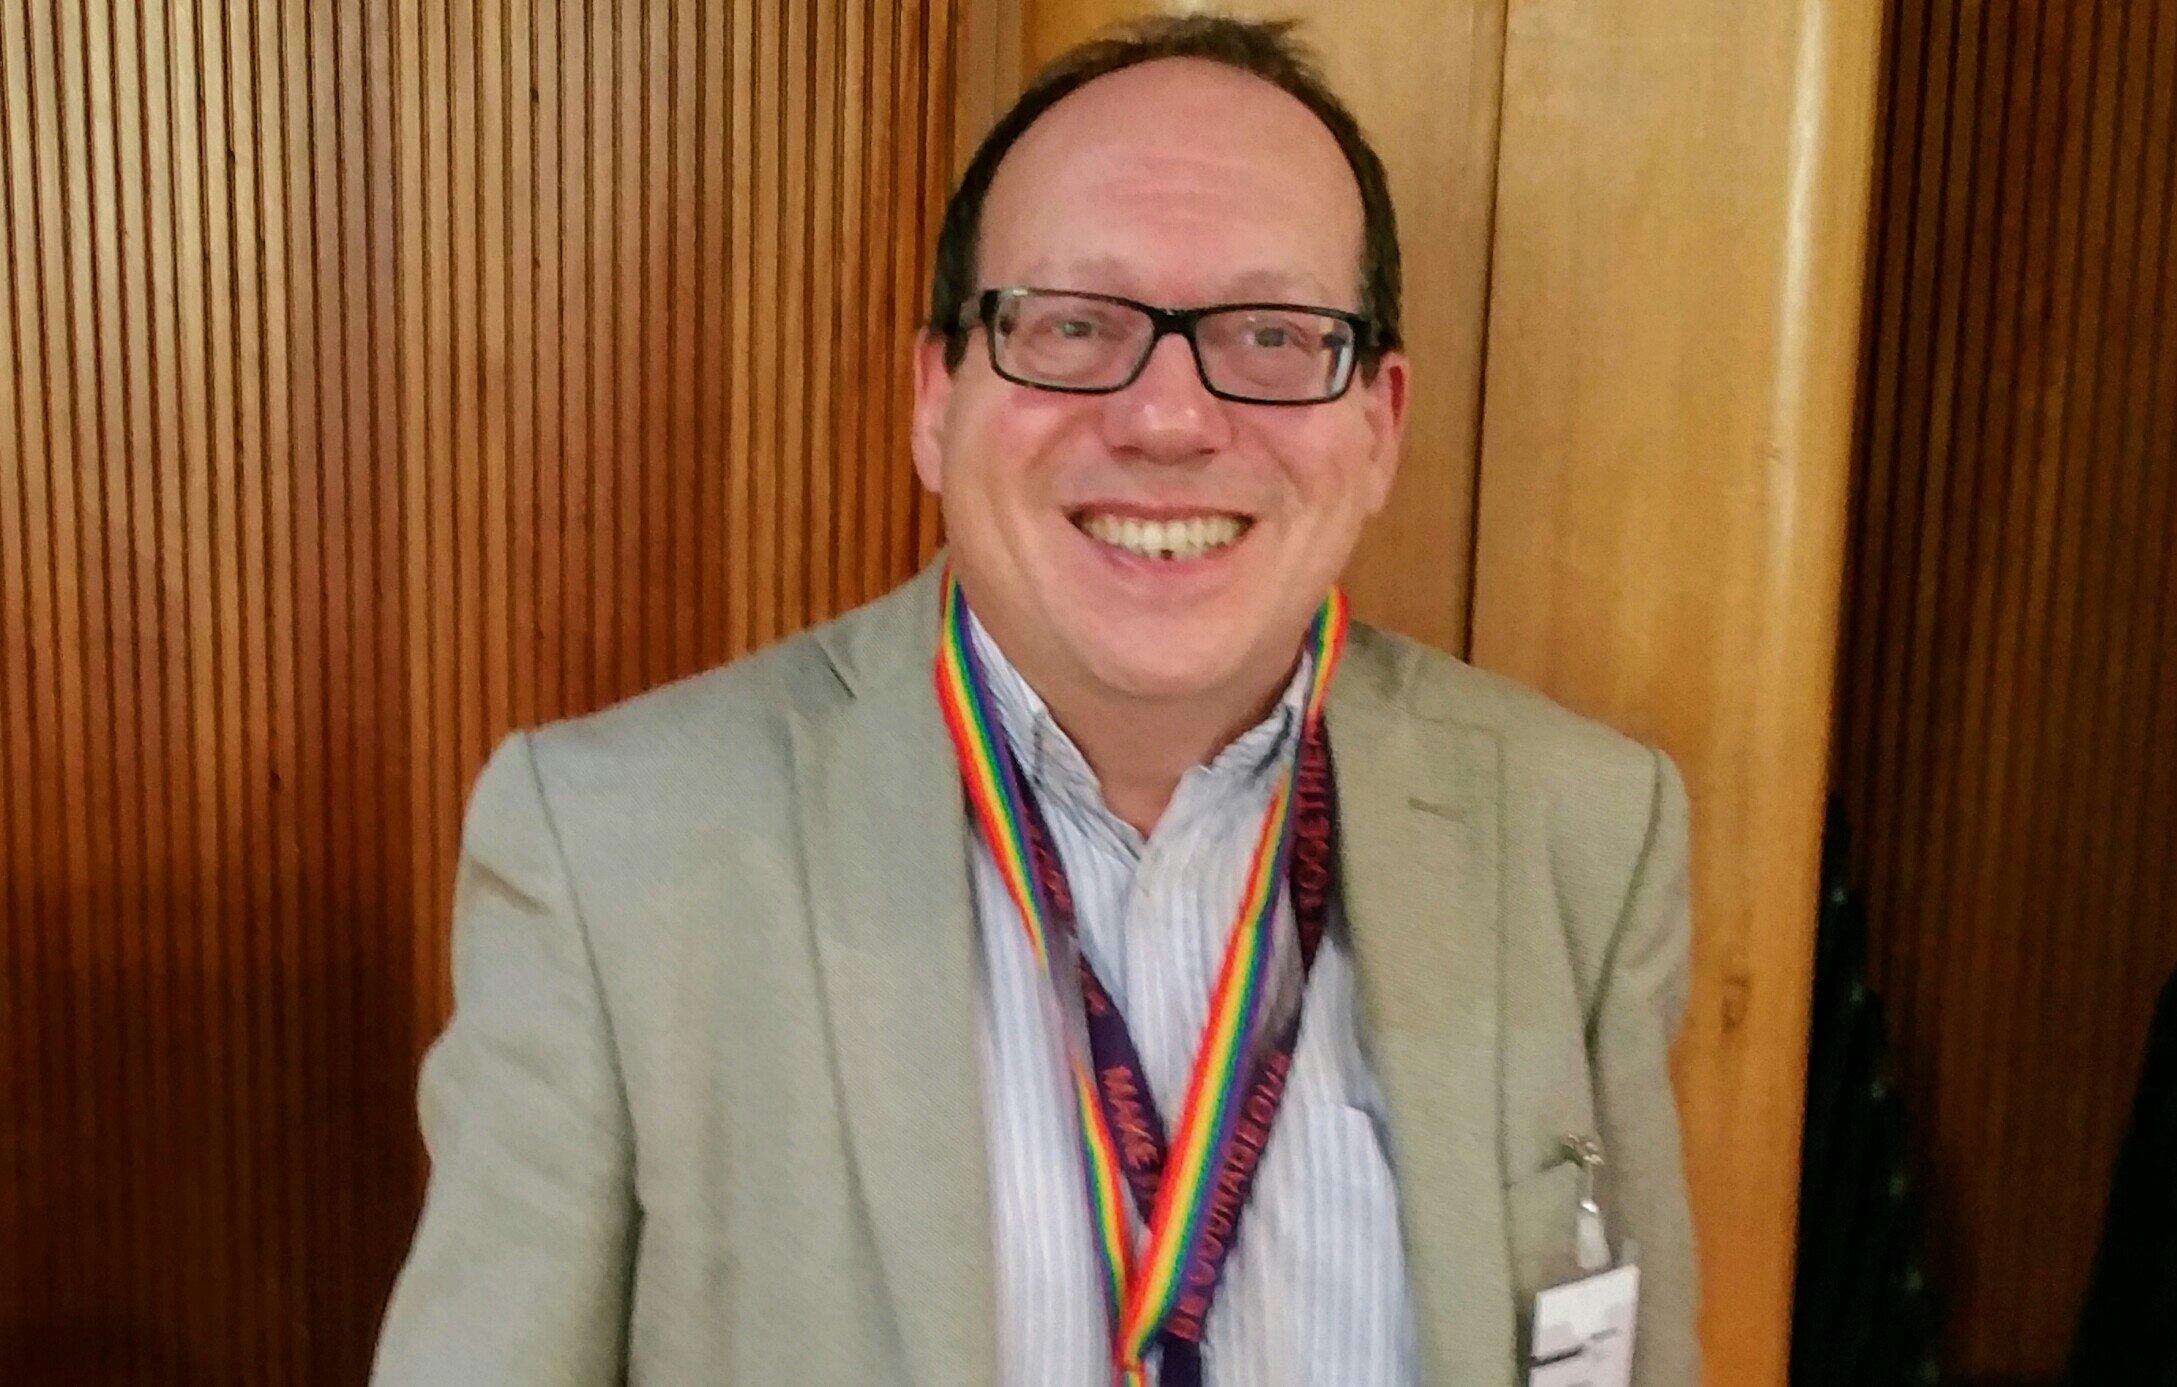 Shout out to Harrow Business Development genie, Mark Billington.